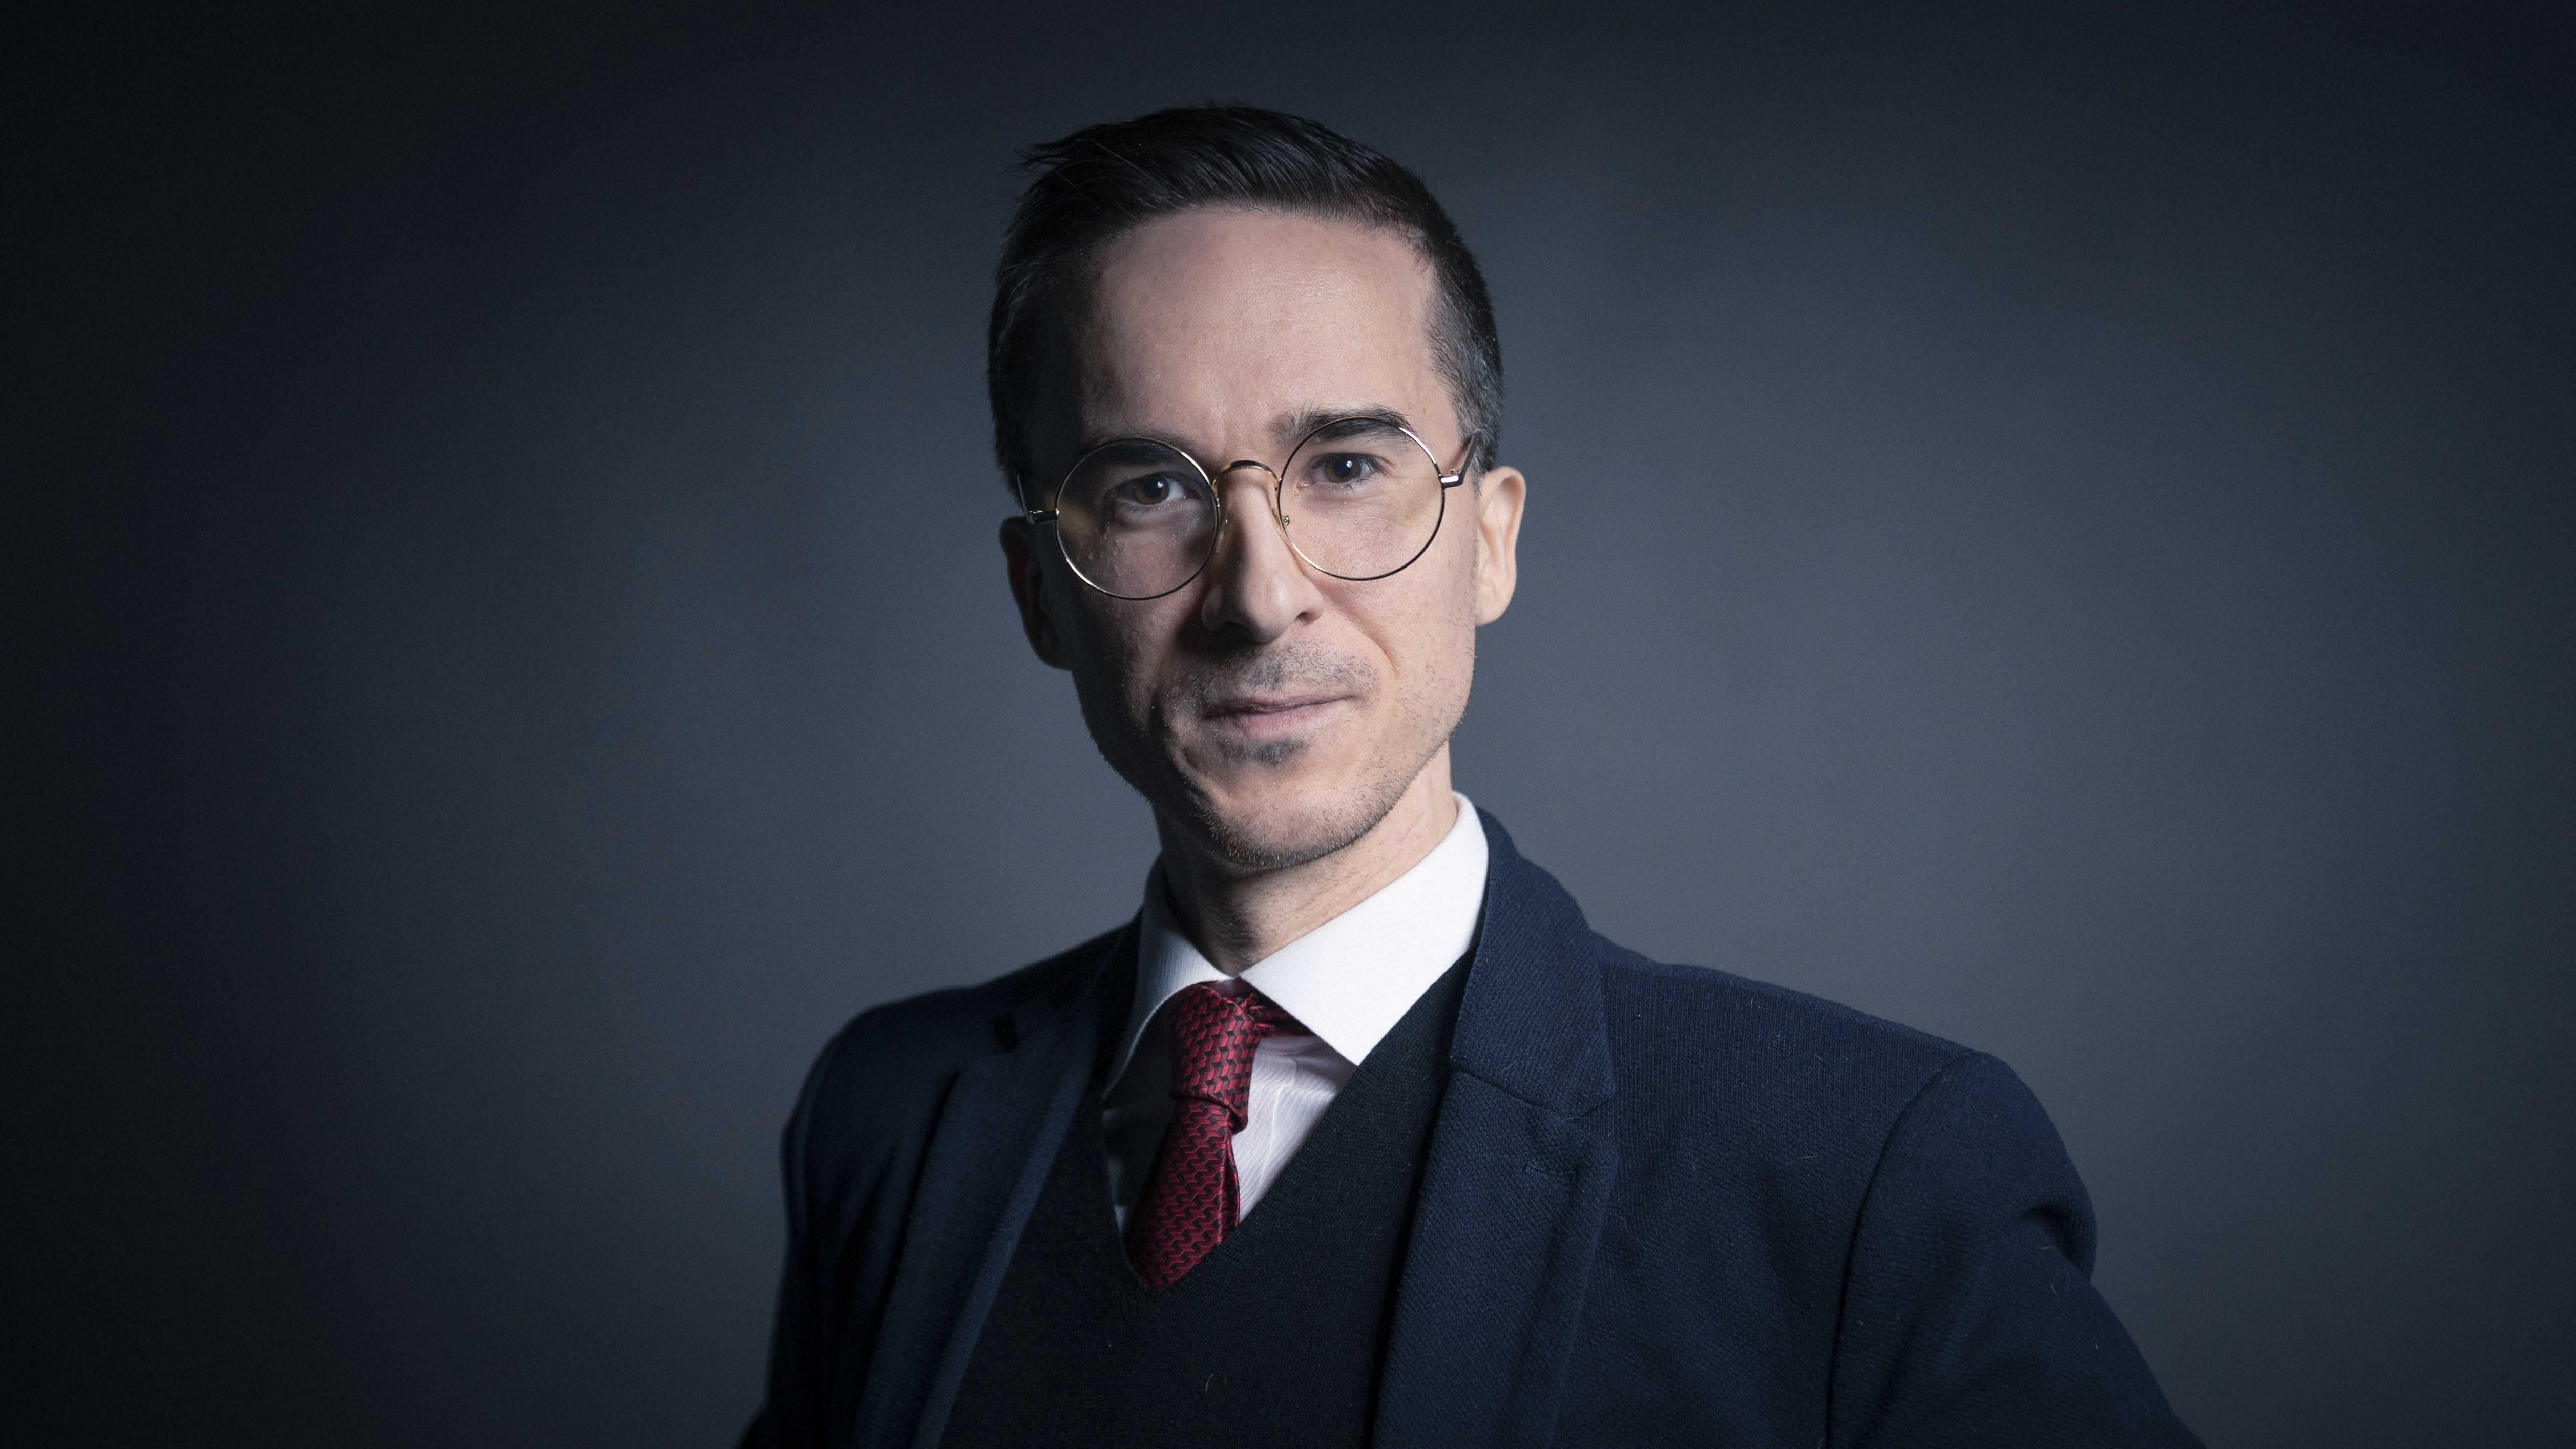 Alexander Puutio / kolumnisti / 03.12.2019 Pasila